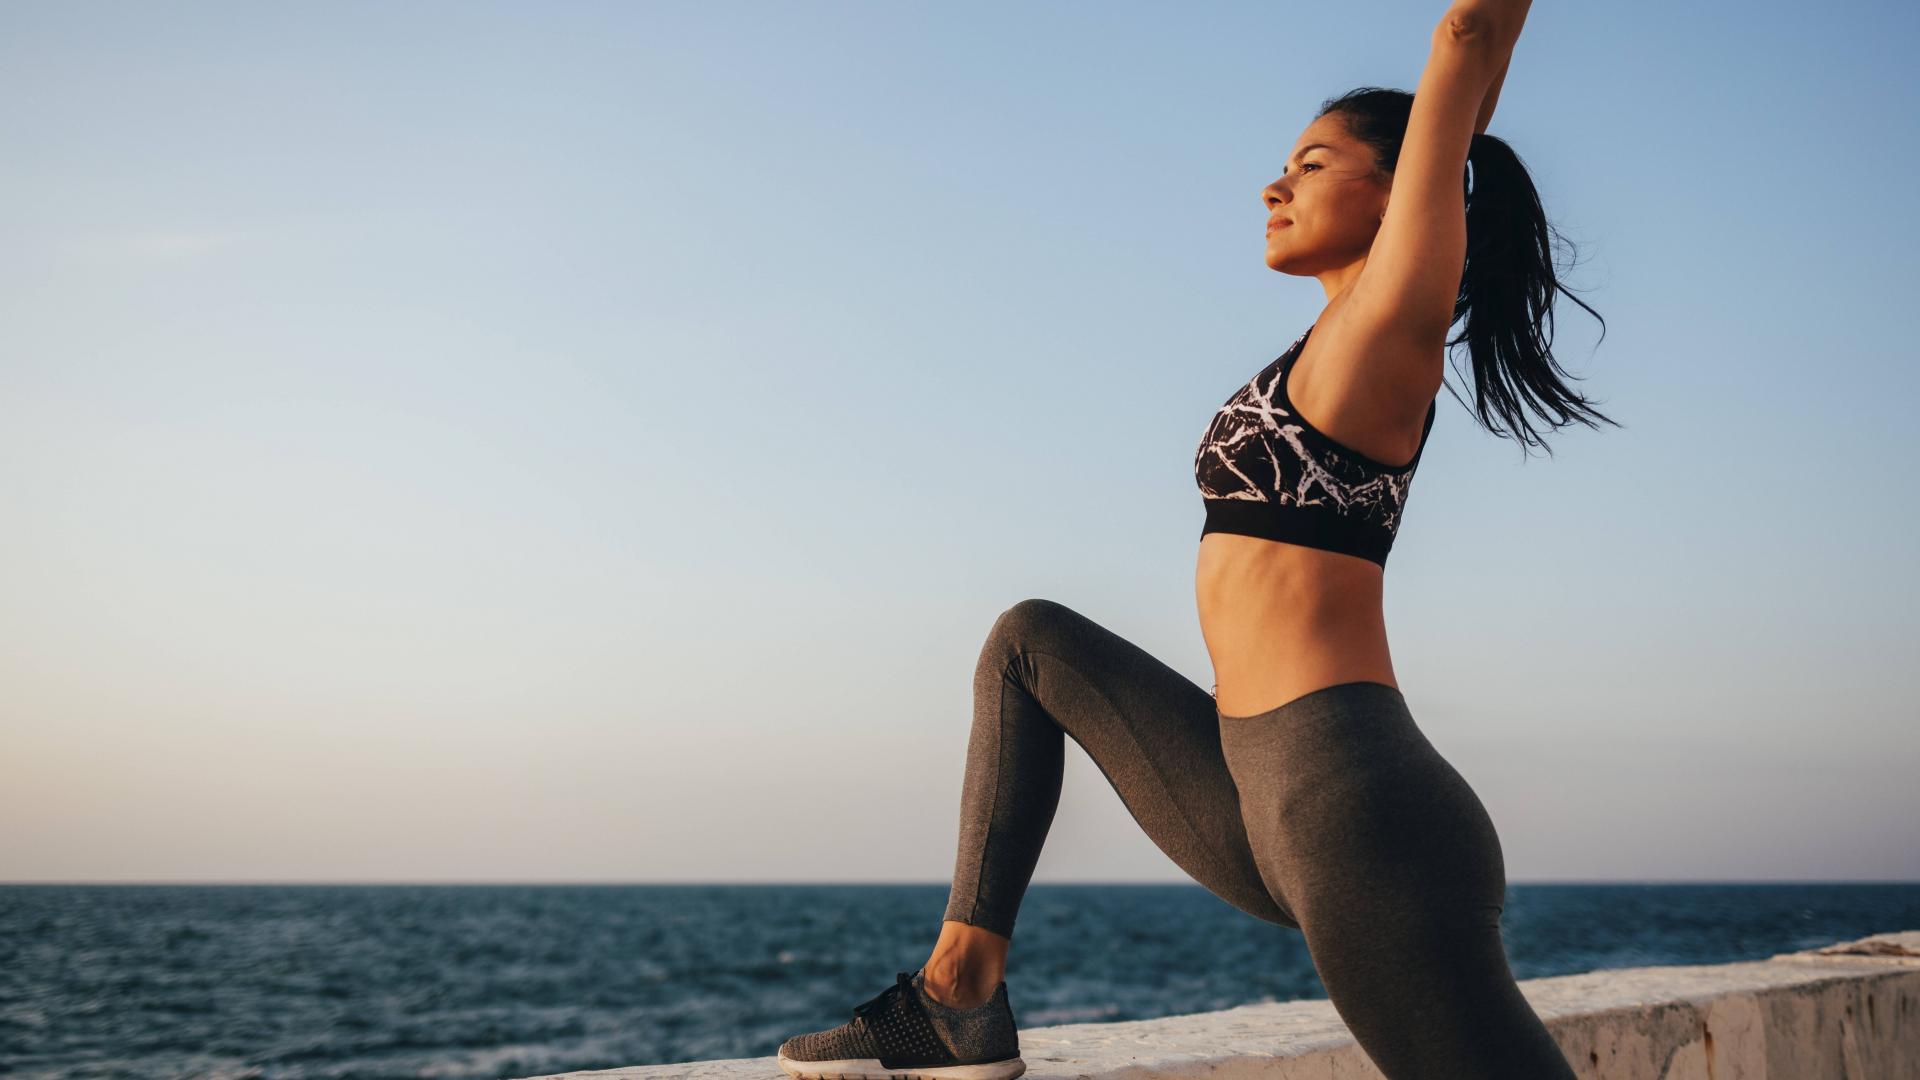 Yoga, Frau, Meer, Sport, Workout, gesund.